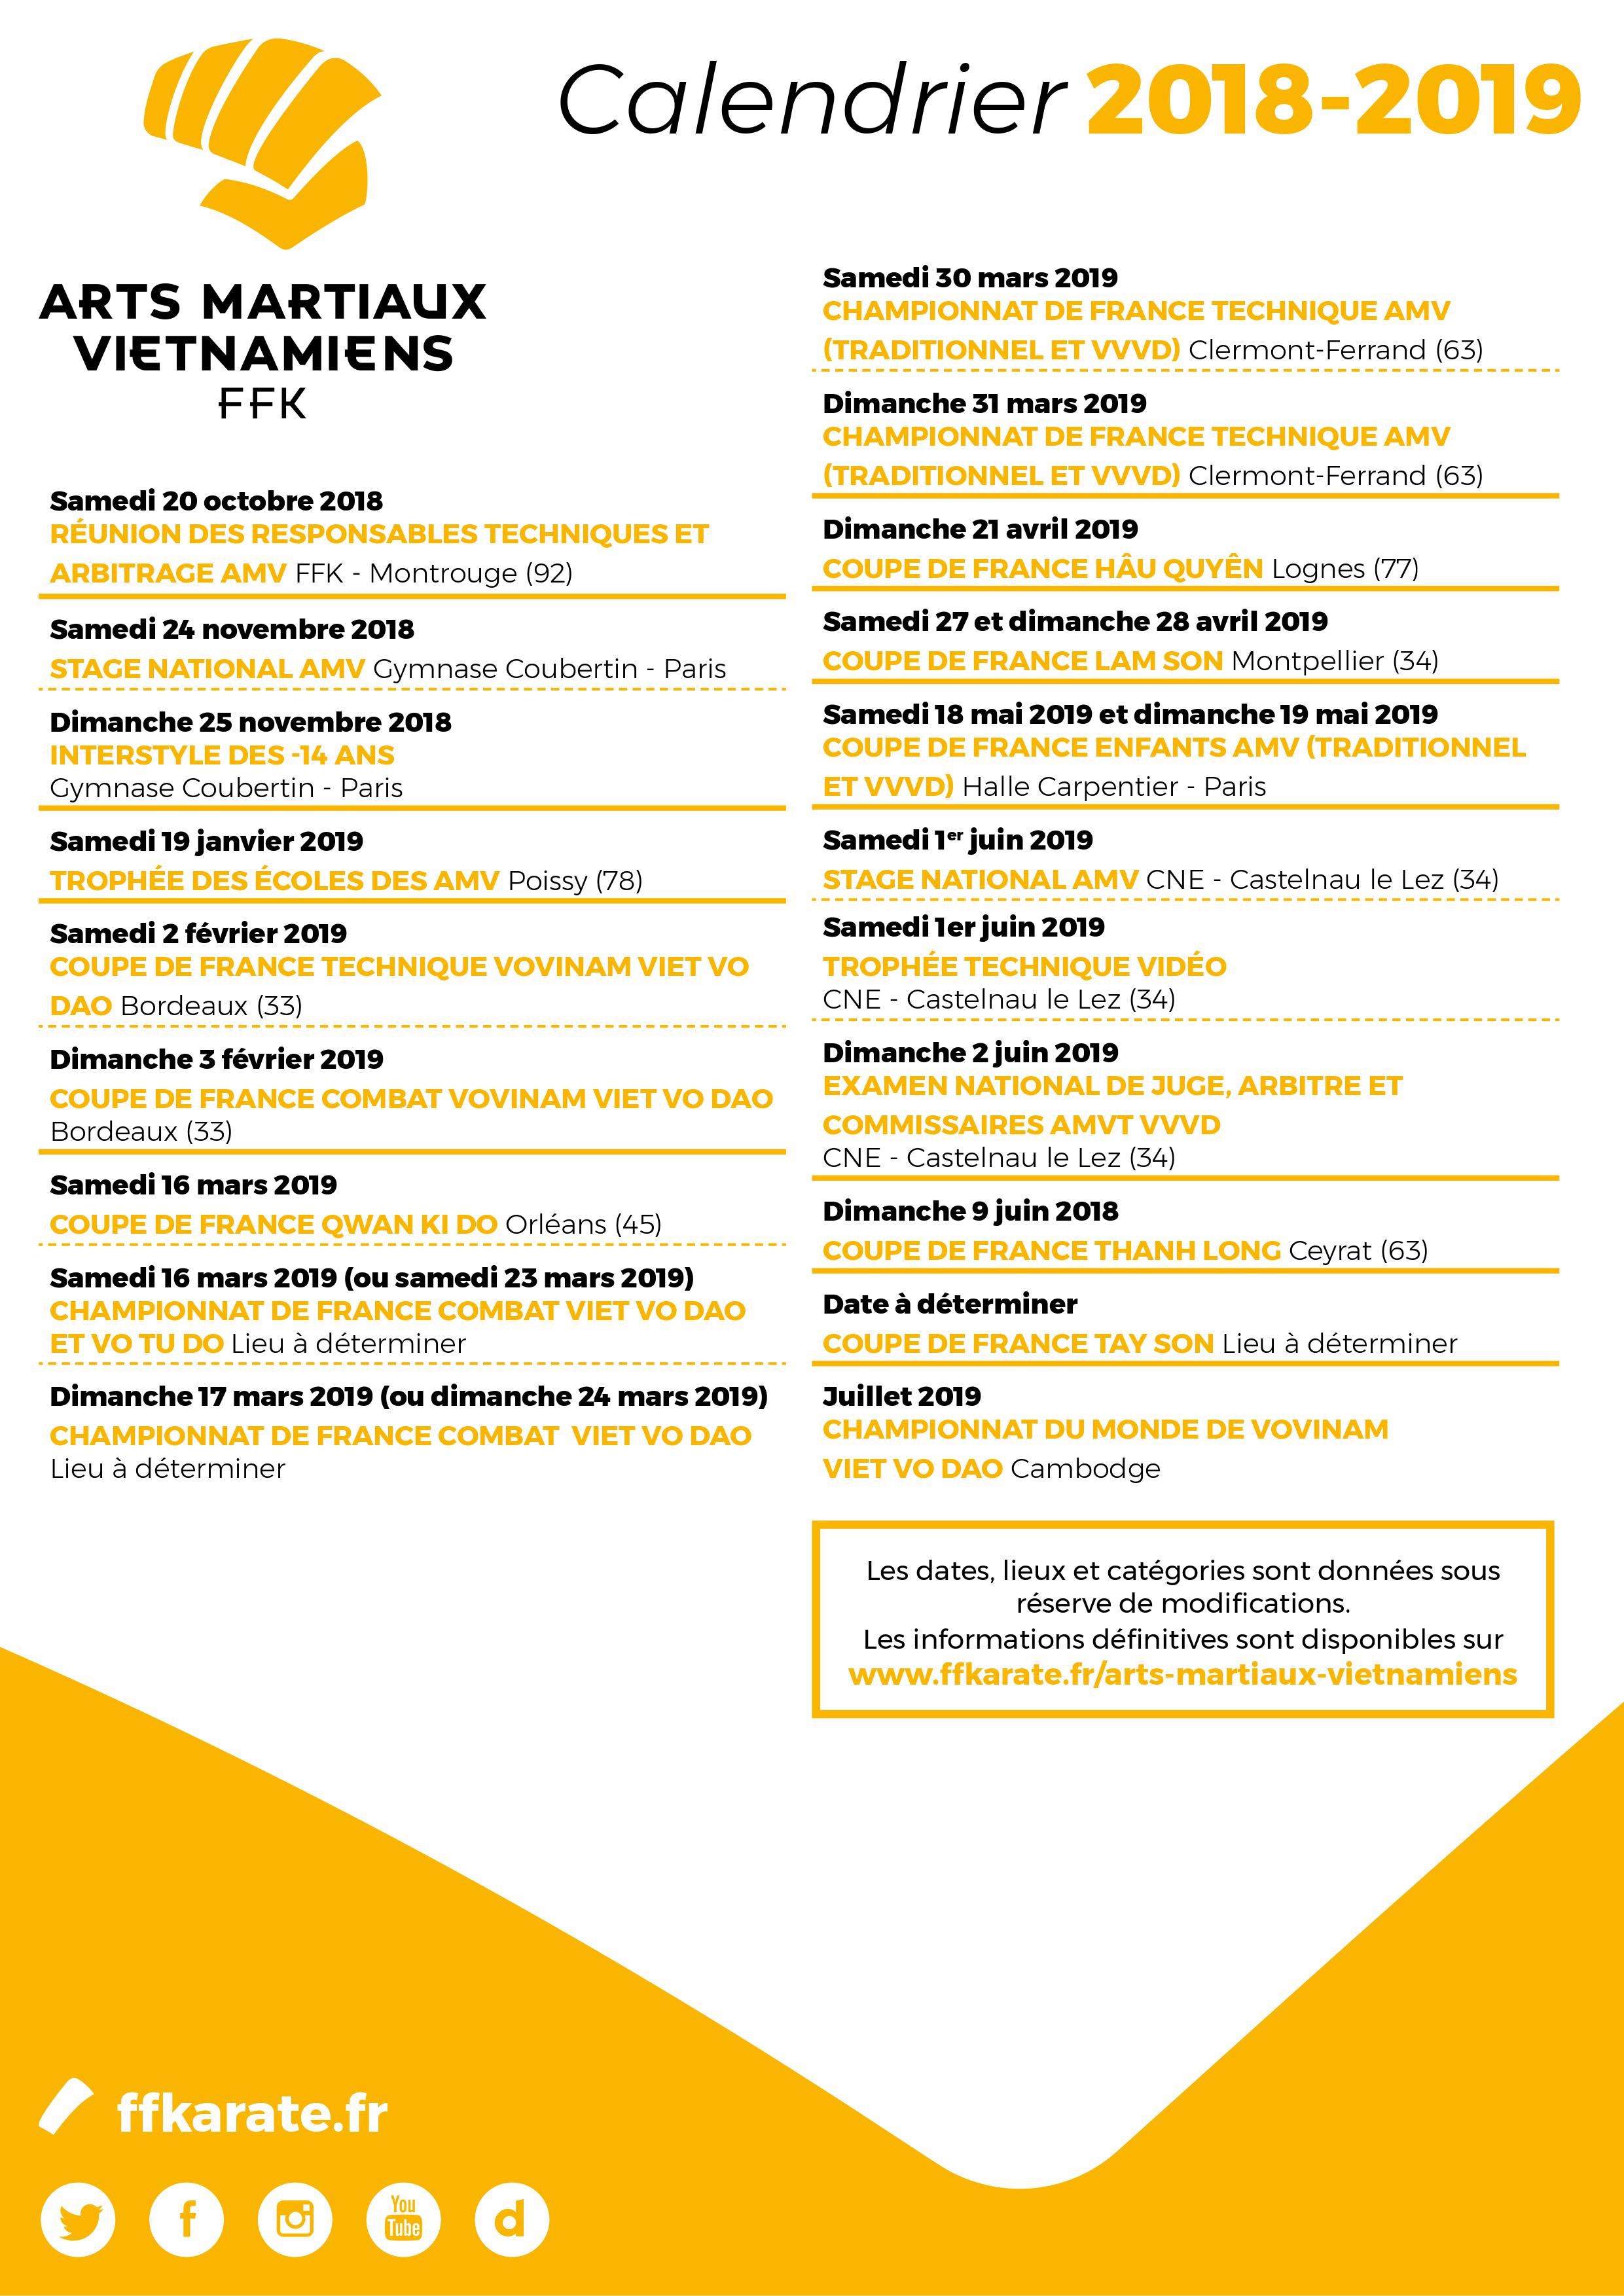 Calendrier Ffkda 2019 2020.Calendrier Des Amv 2018 2019 Lam Son Vo Dao Poissy